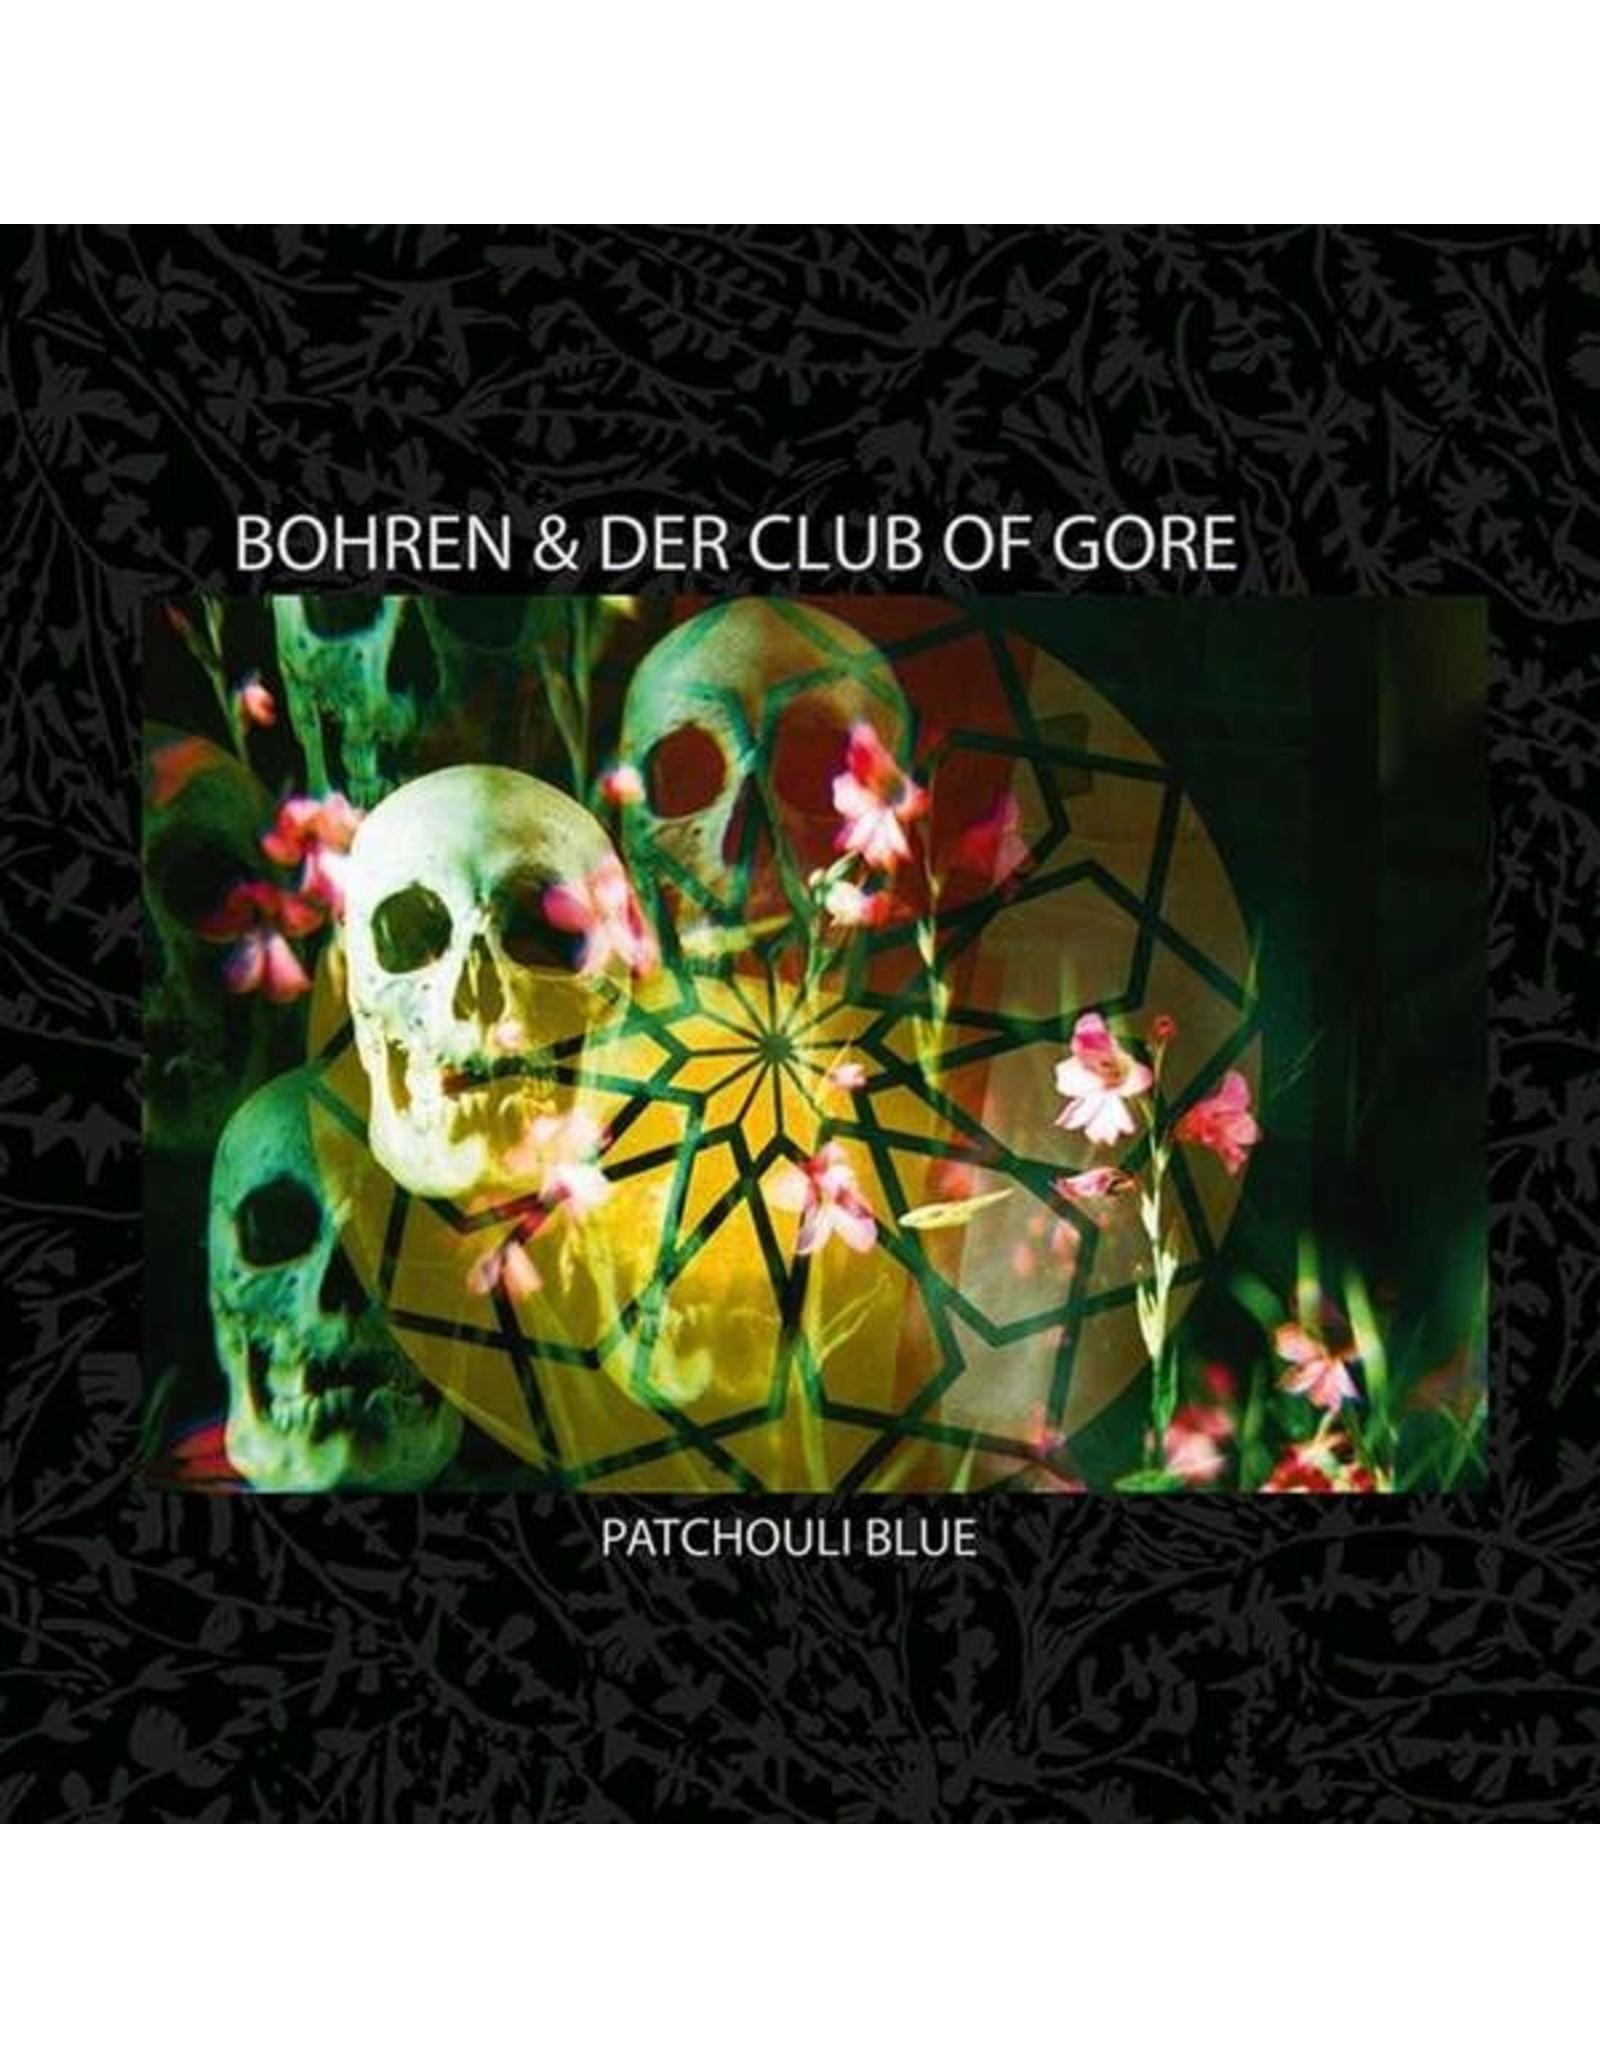 Bohren & Der Club Of Gore - Patchouli Blue 2LP